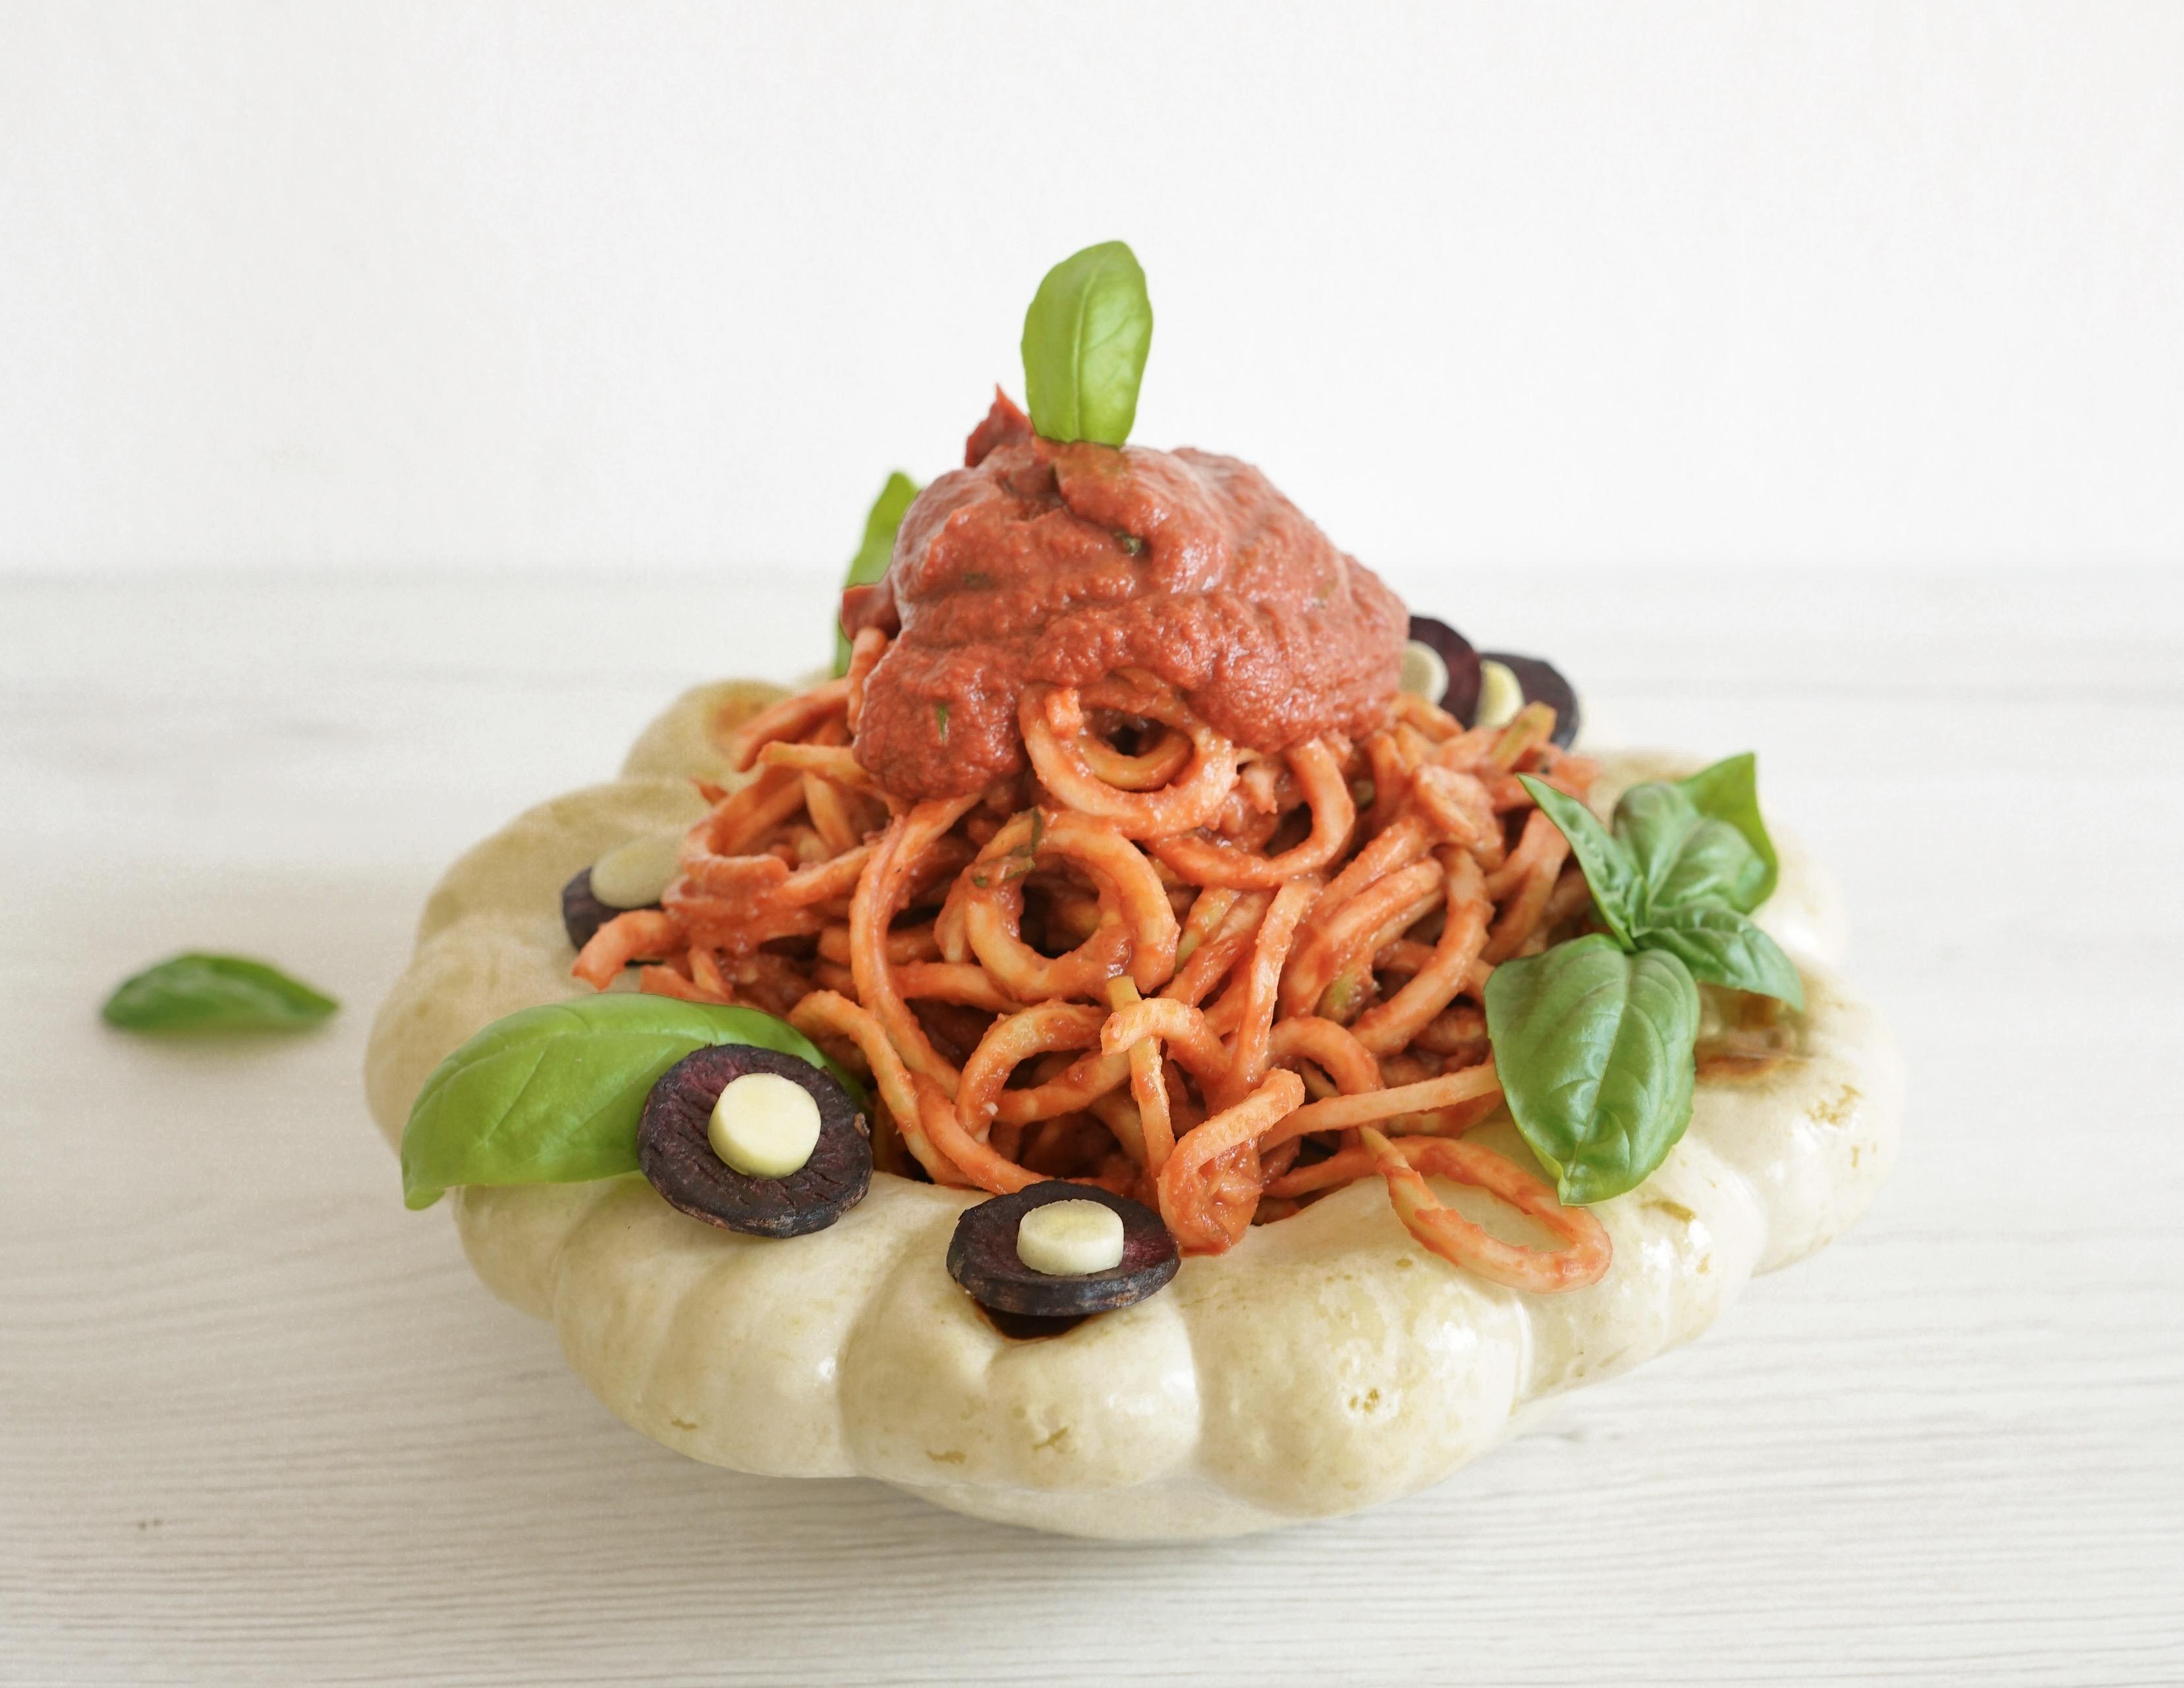 AIP Italian Food - Nomato-Sauce-Tomato-Free-Marinara-Sauce